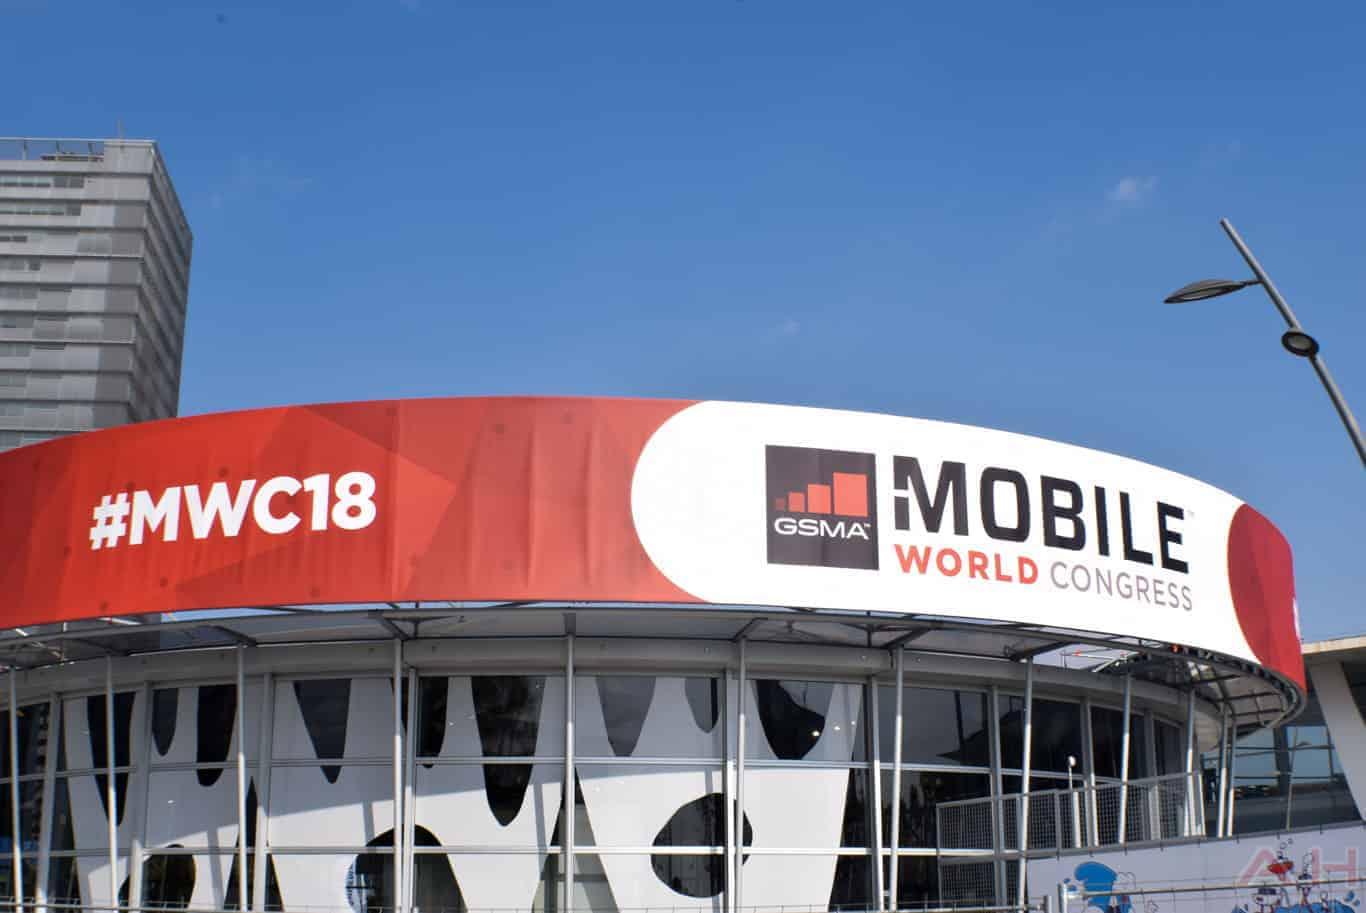 Mobile World Congress MWC 18 Logo AM AH 11